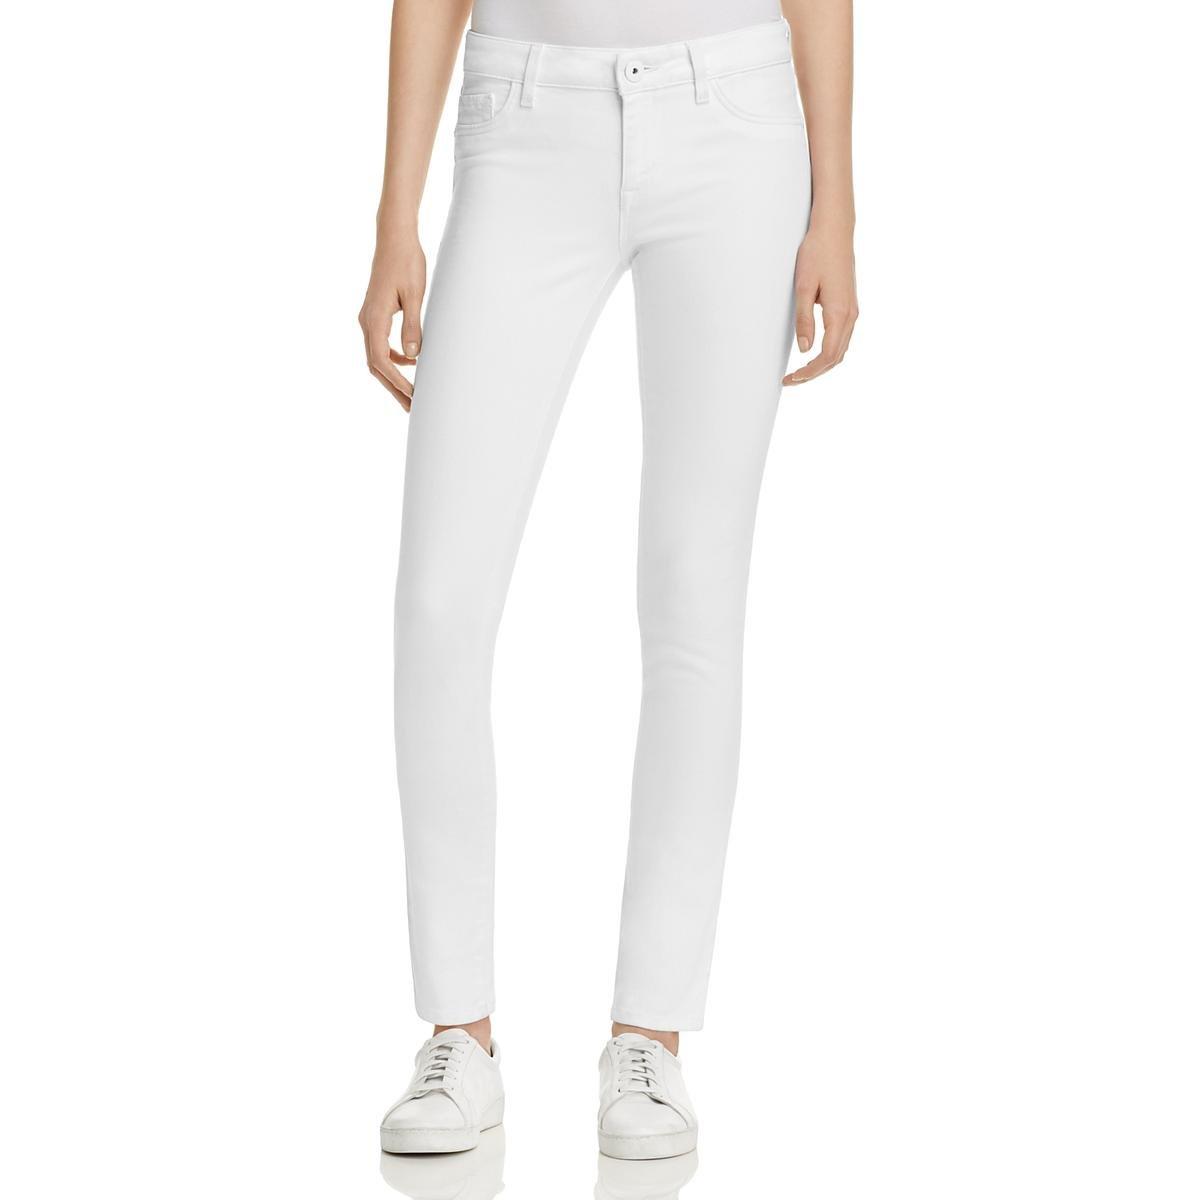 DL1961 Women's Camila Skinny Fit Jeans, Porcelain, 32